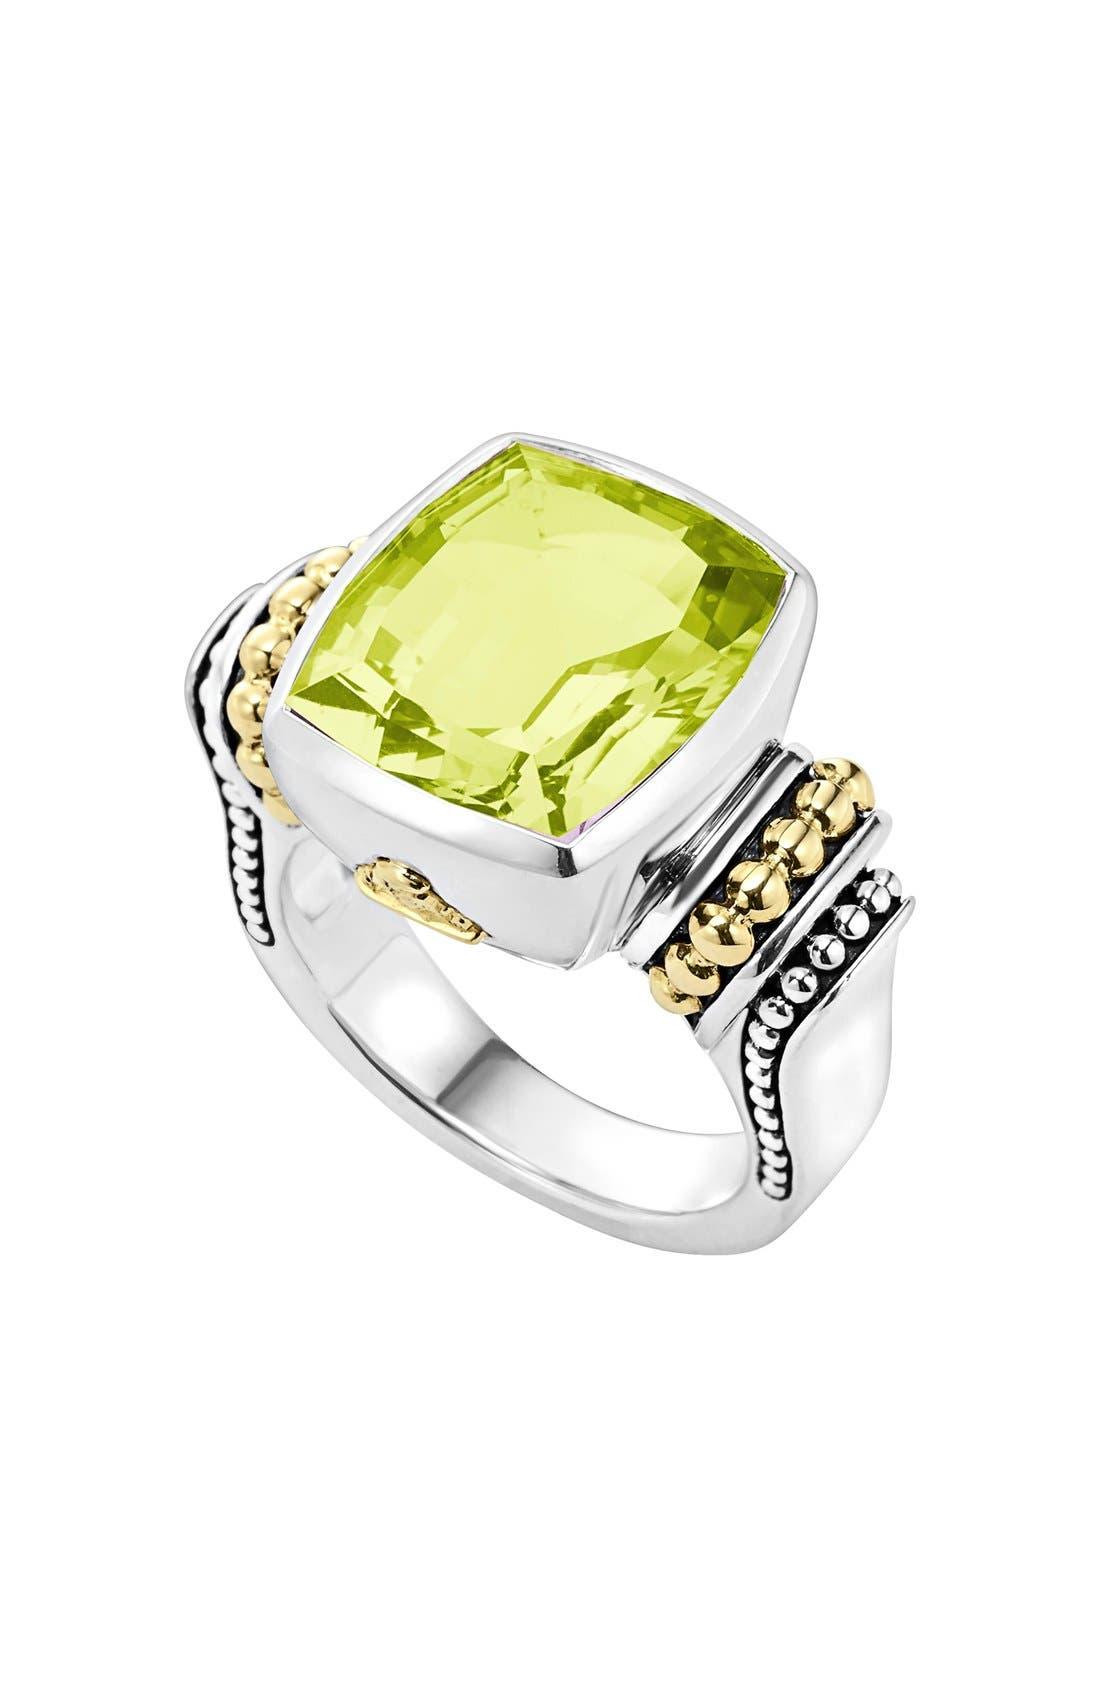 Alternate Image 1 Selected - LAGOS 'Caviar Color' Medium Semiprecious Stone Ring